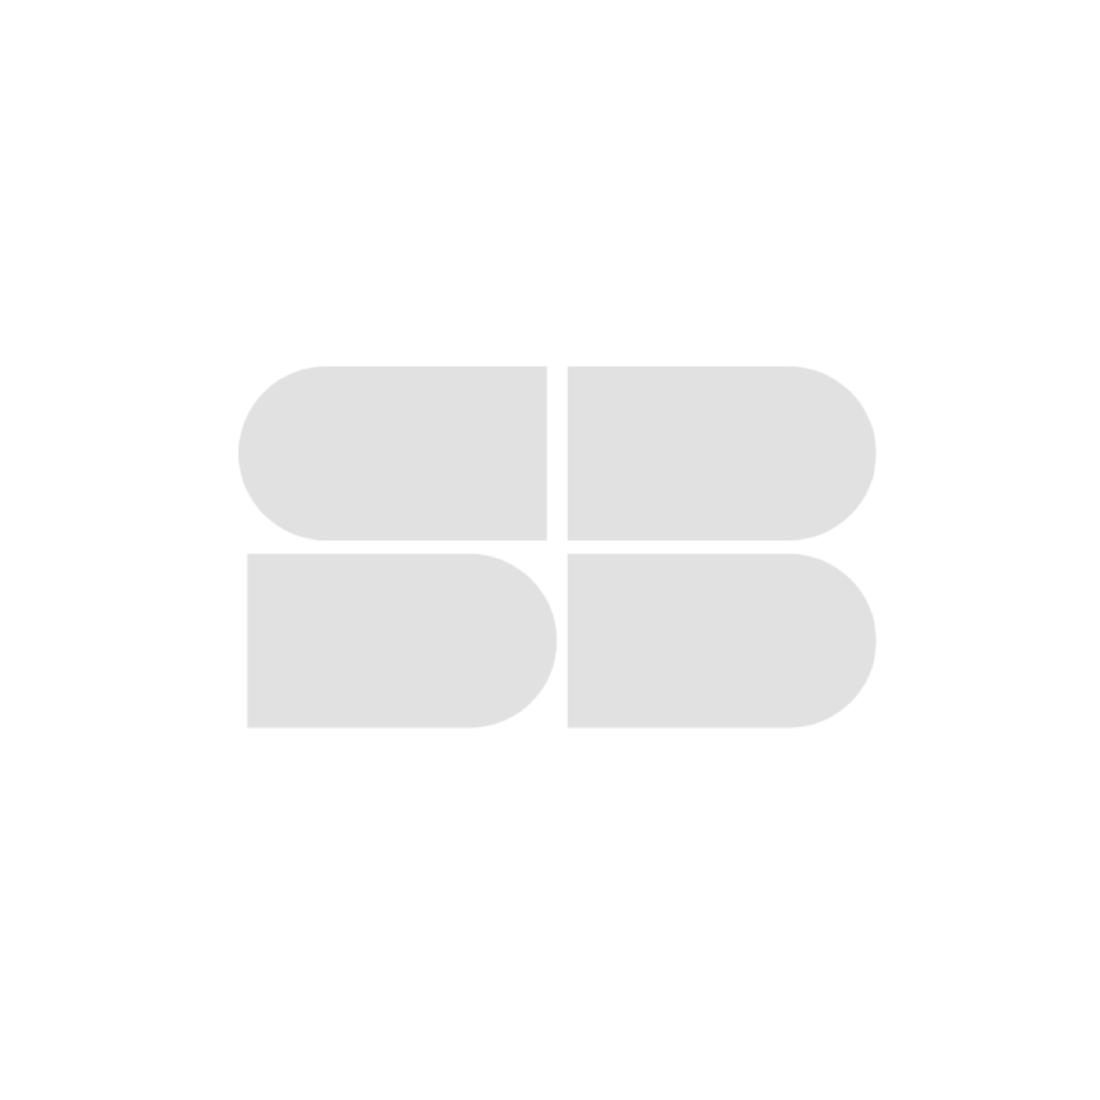 19196220-compound-furniture-sofa-recliner-corner-sofa-01